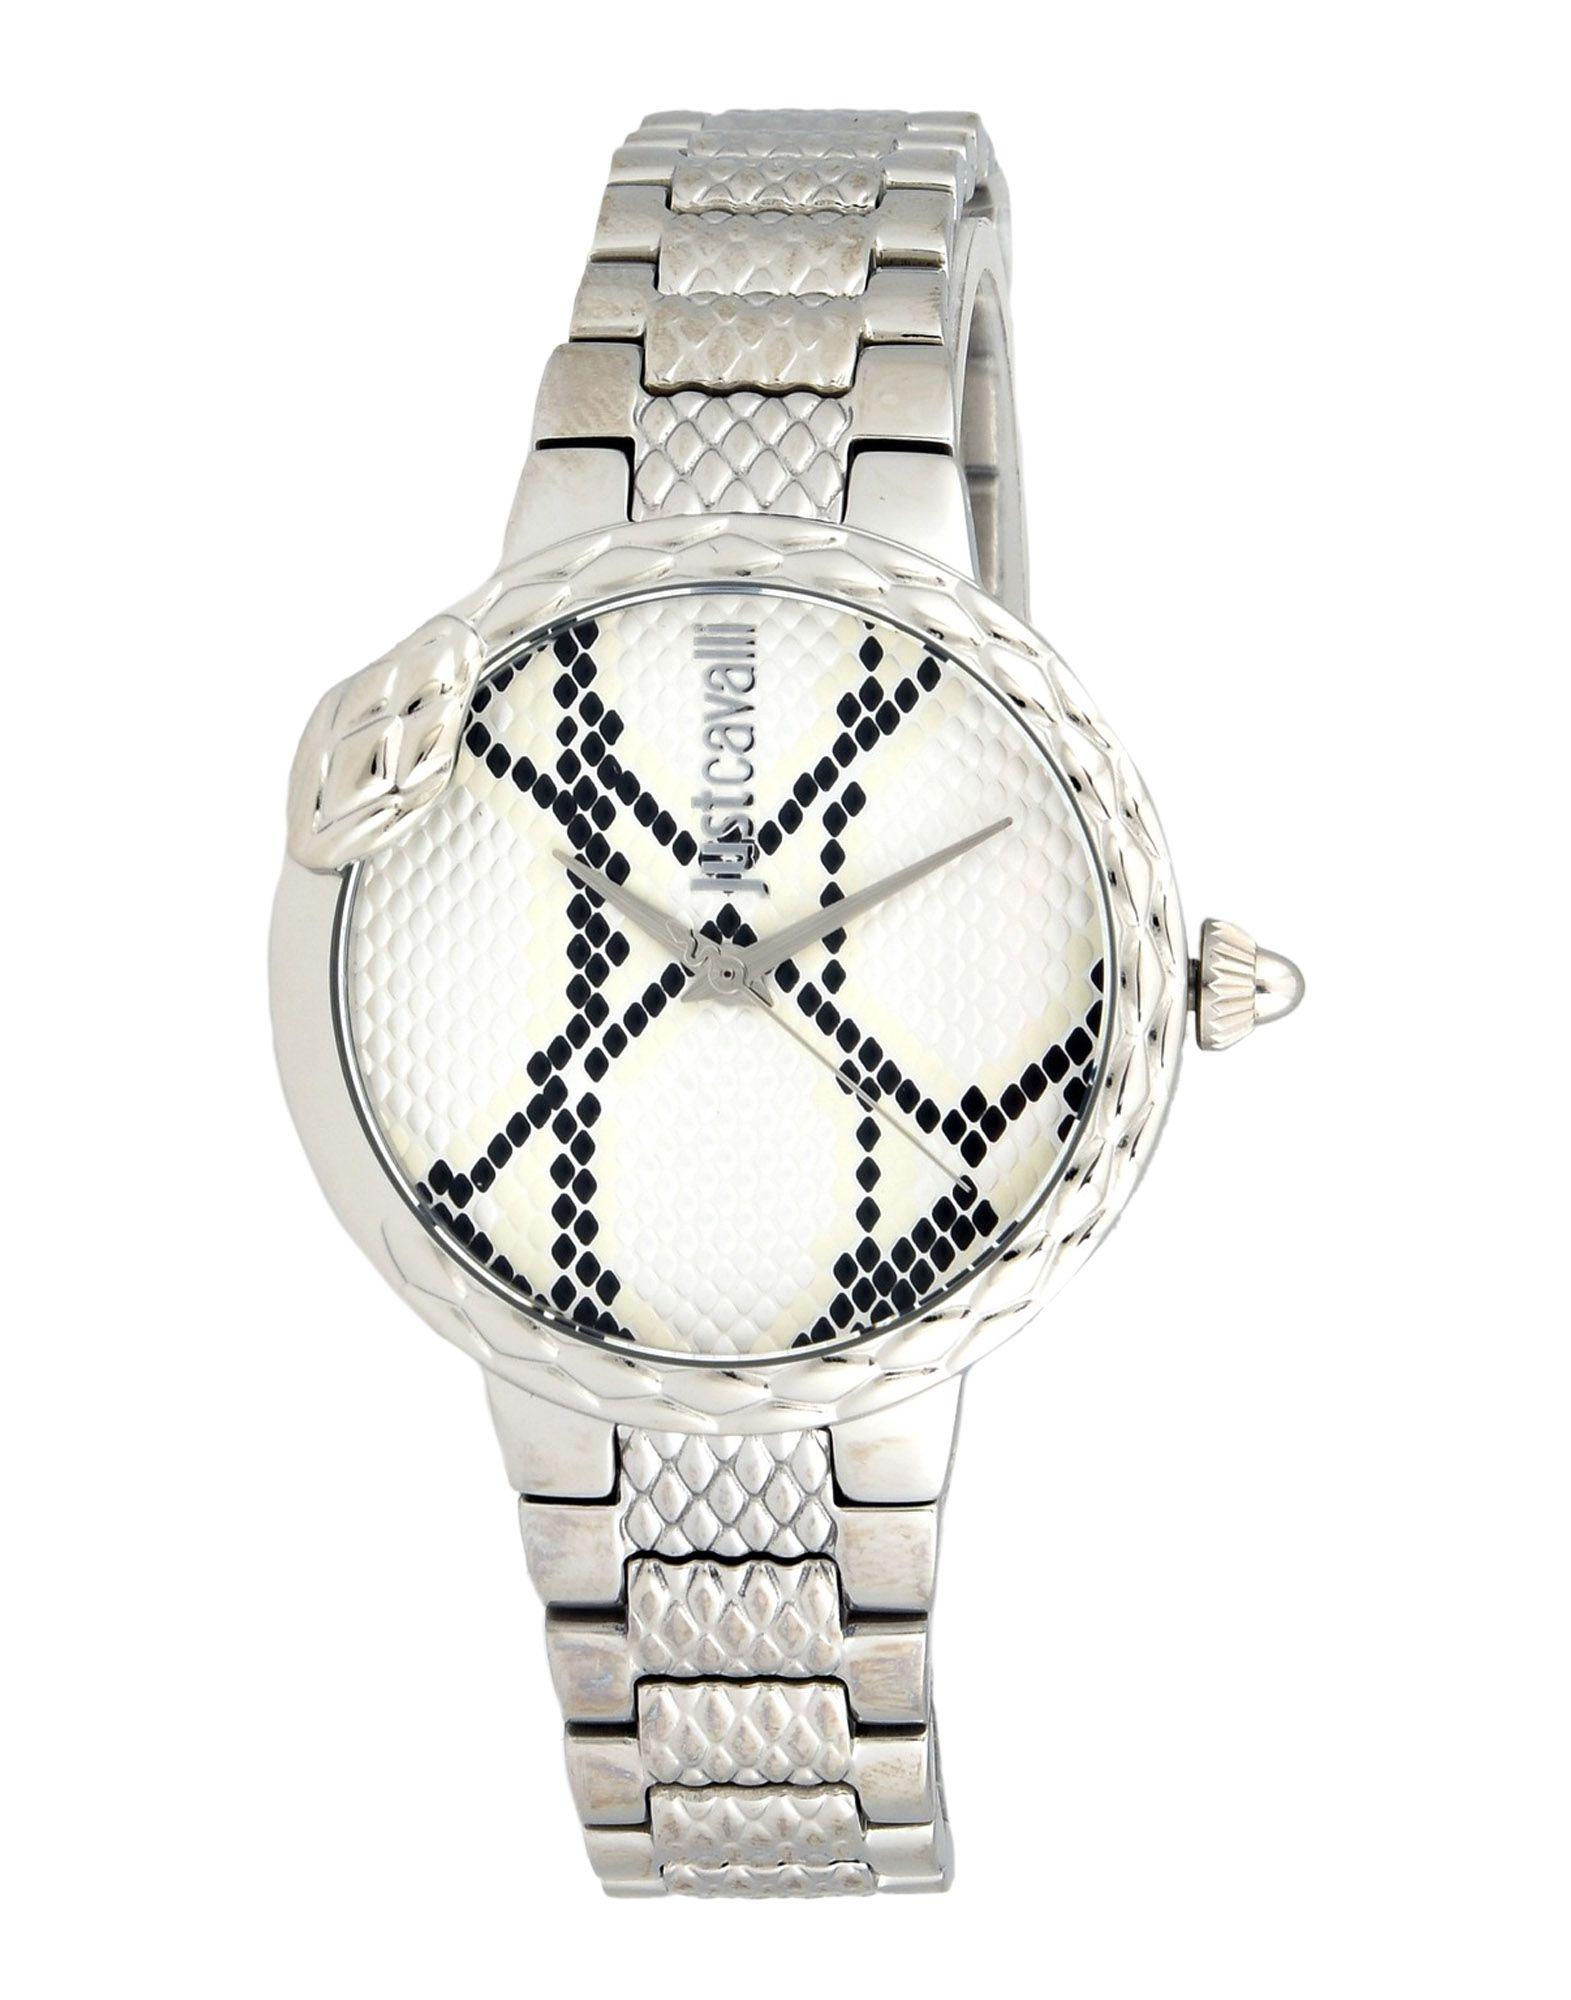 JUST CAVALLI Наручные часы женские наручные